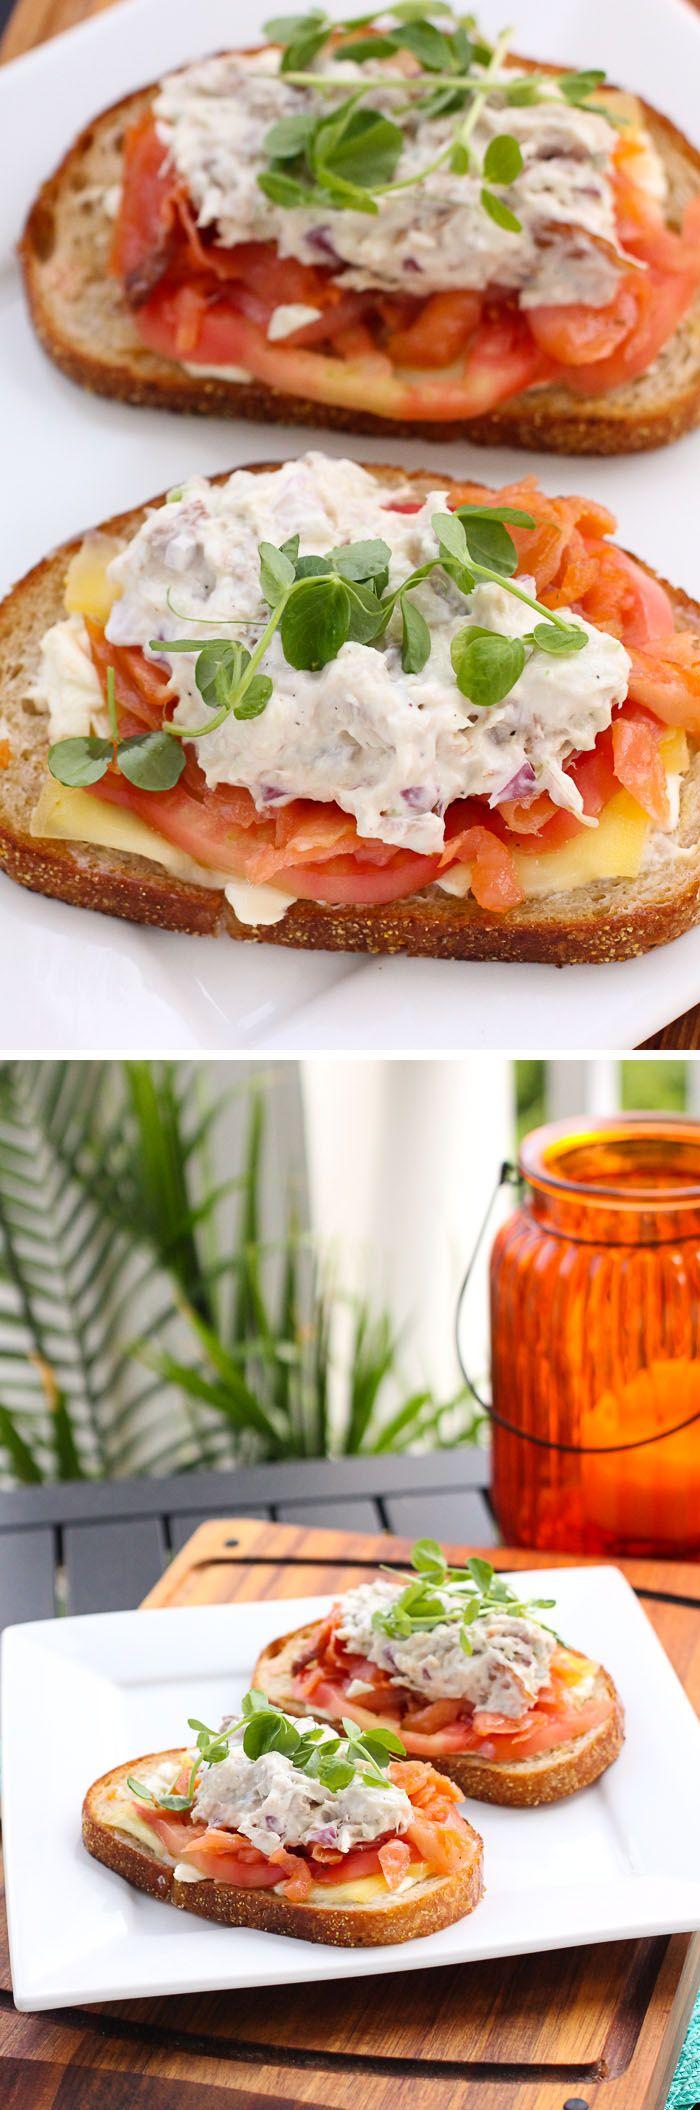 Smoked Salmon and Whitefish Salad Melts